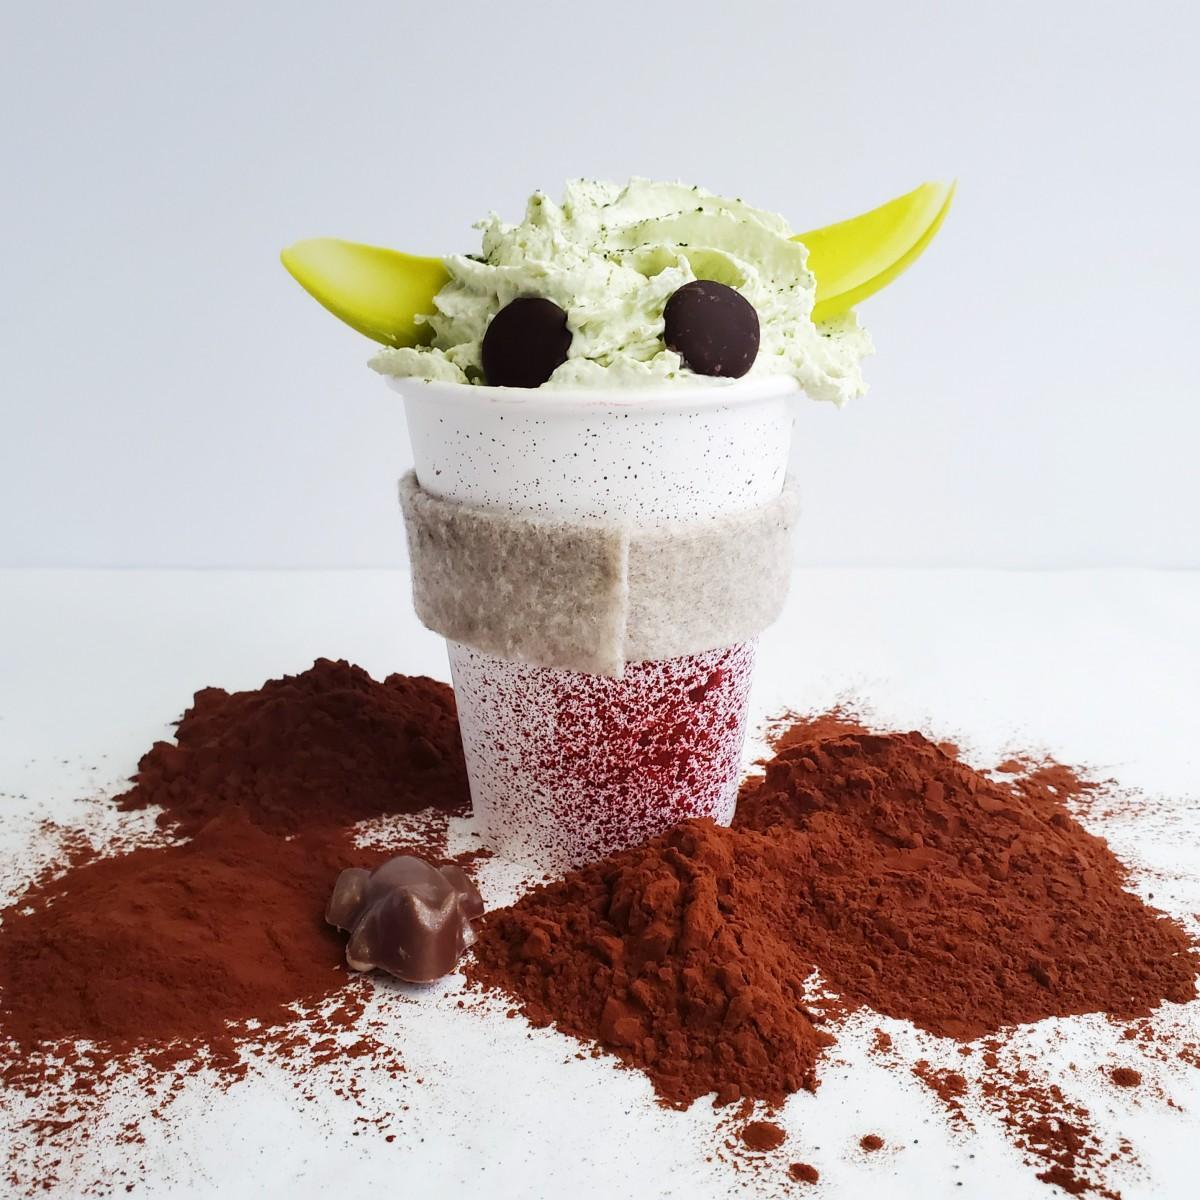 Soirette Pastry Boutiqueが提供する、ほうじ茶入りホットチョコレート「Hot Yoda」(写真=Soirette Pastry Boutique)